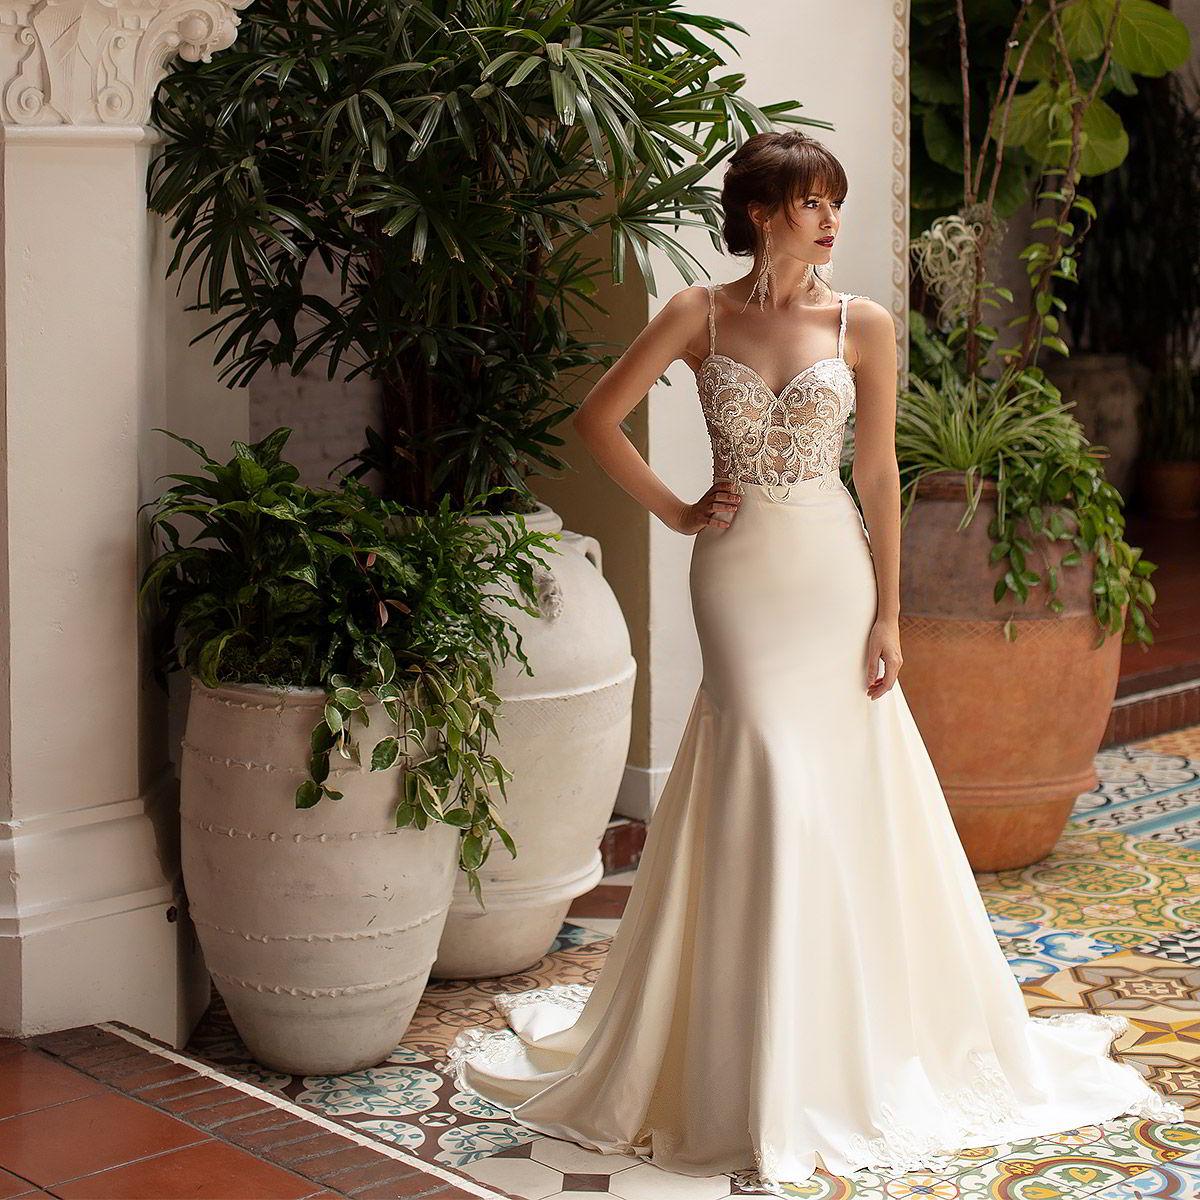 naama anat 2019 bridal collection bombshell wedding inspirasi featured gown thumbnail